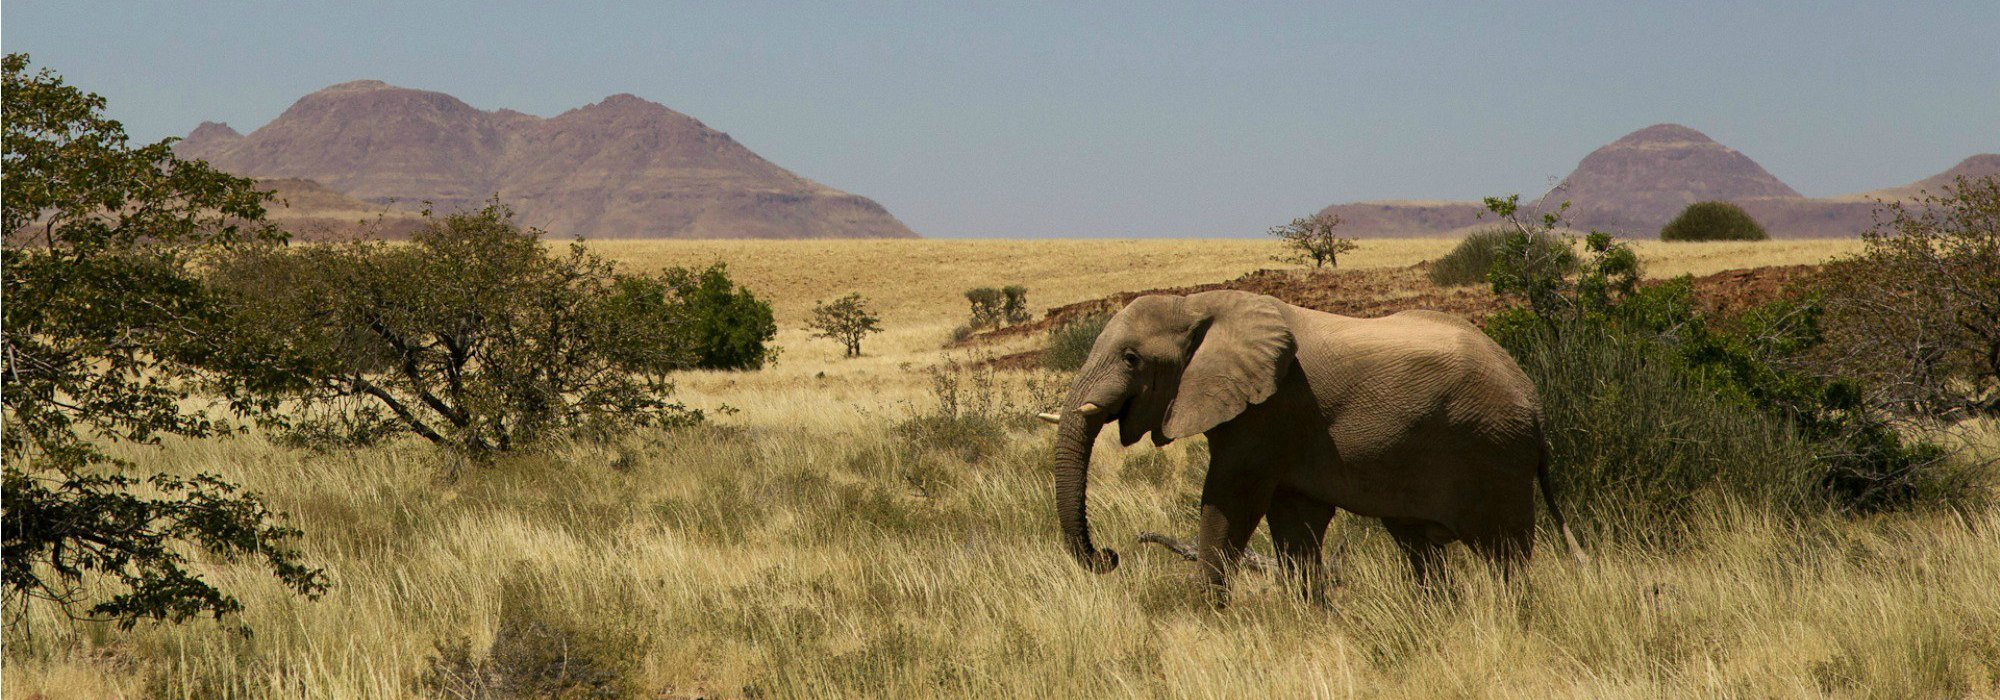 Namibia Desert adapted elephants